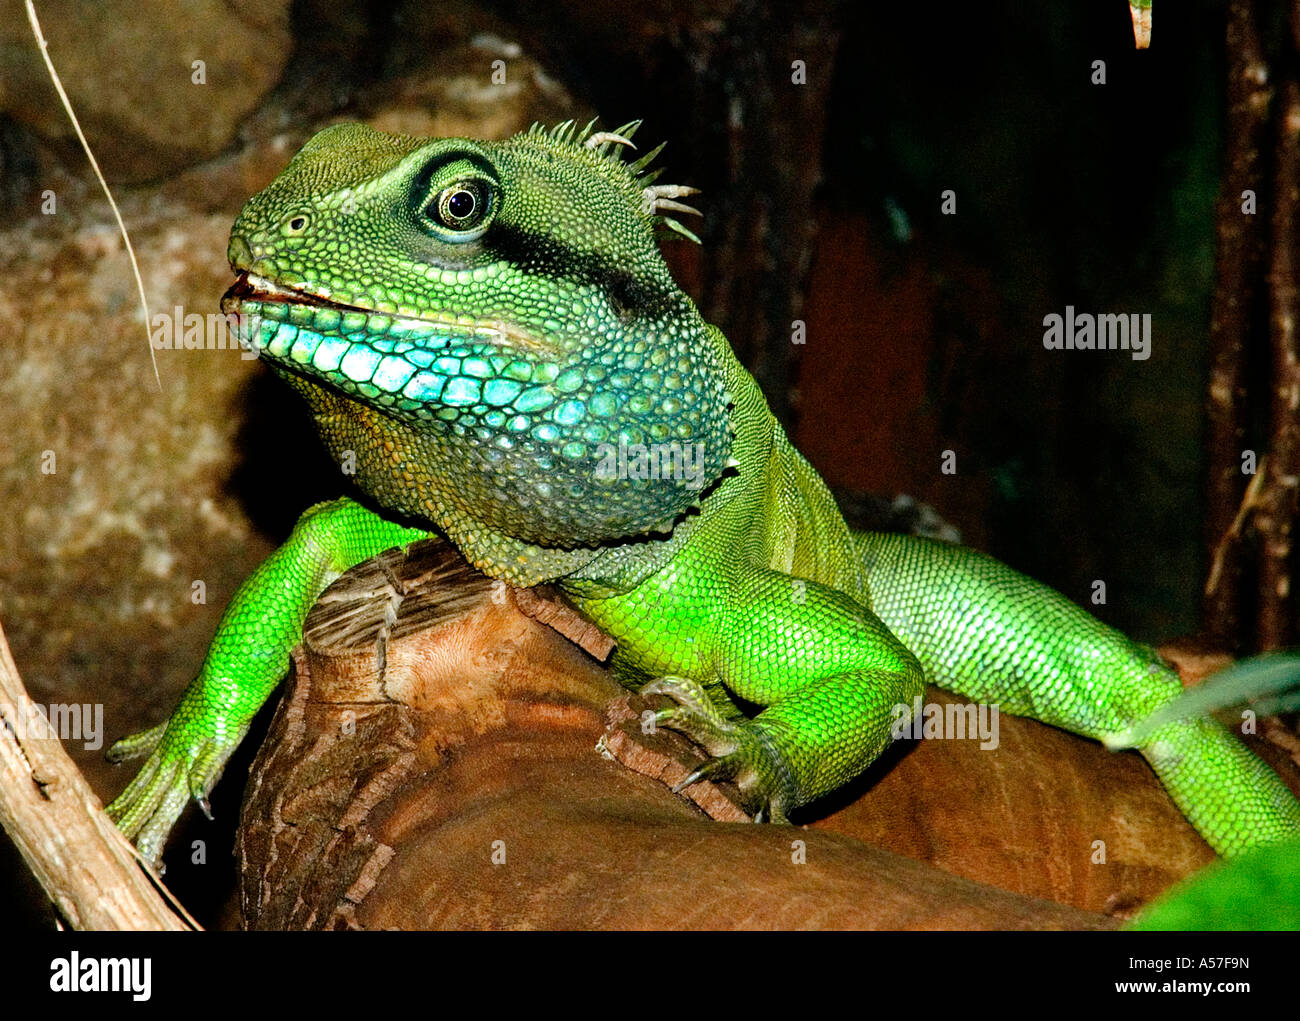 scrub habitat lizard reptile Green Iguana - Stock Image